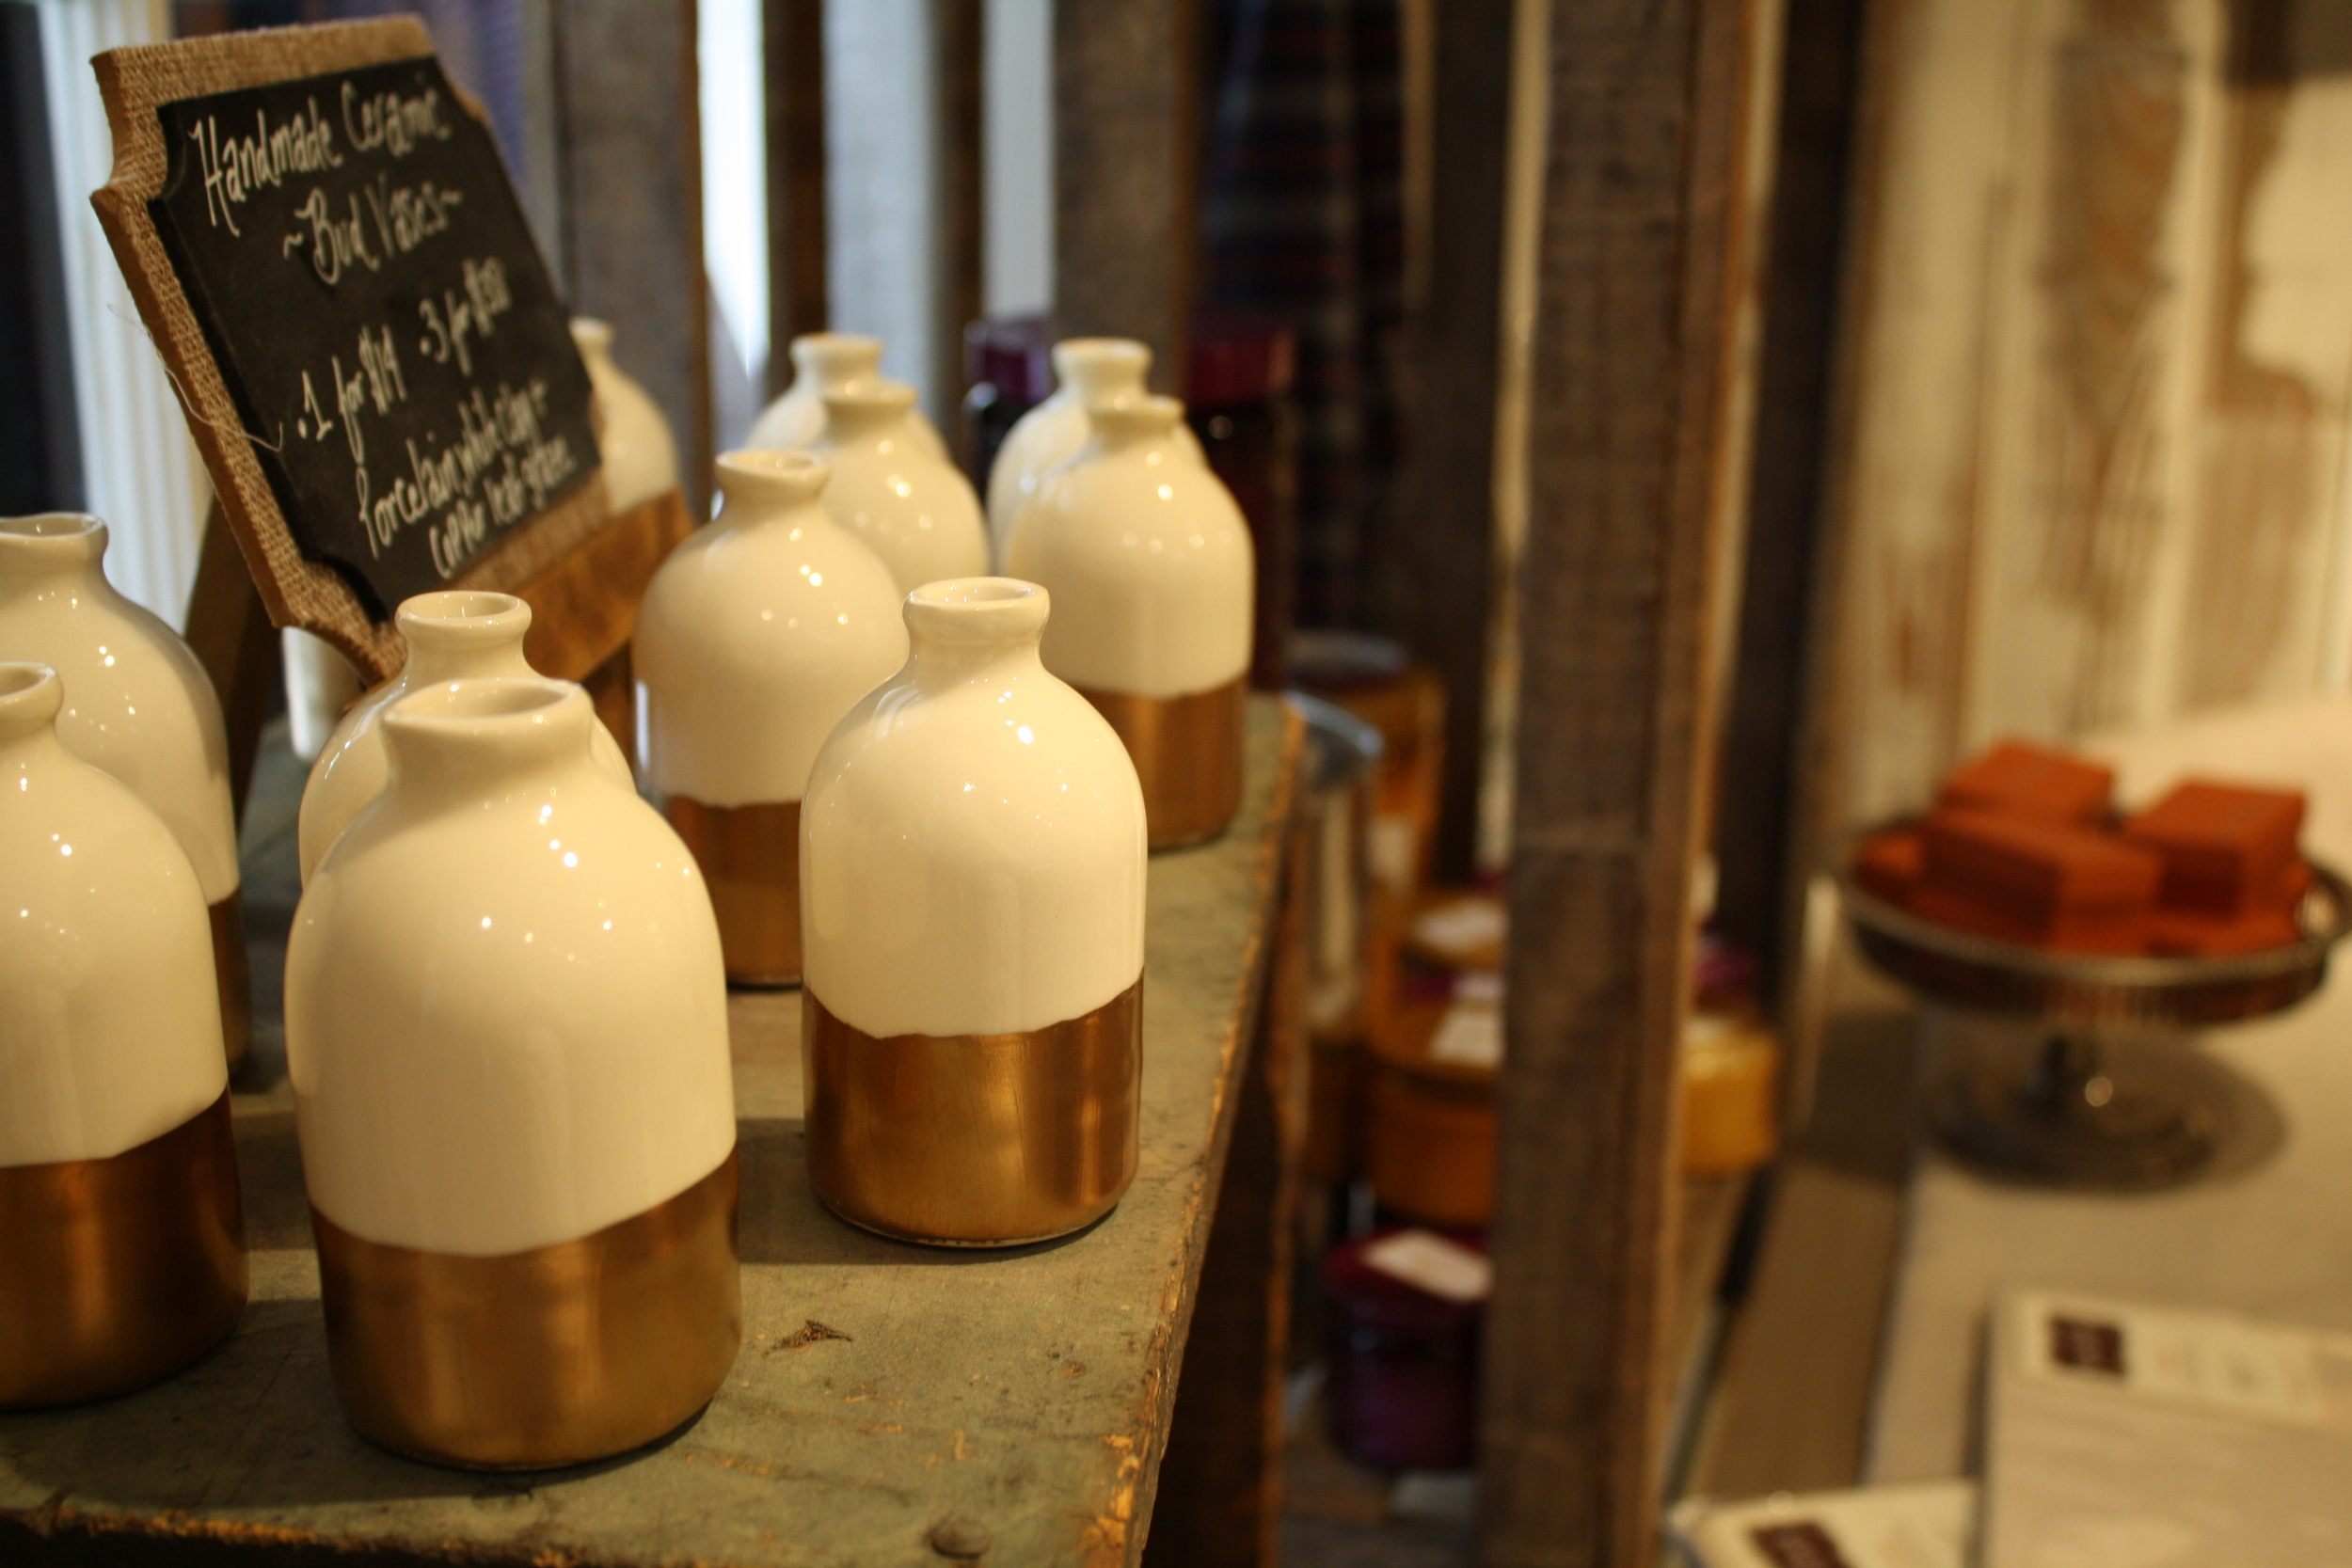 Handmade Bud Vases from Honeycomb Studio